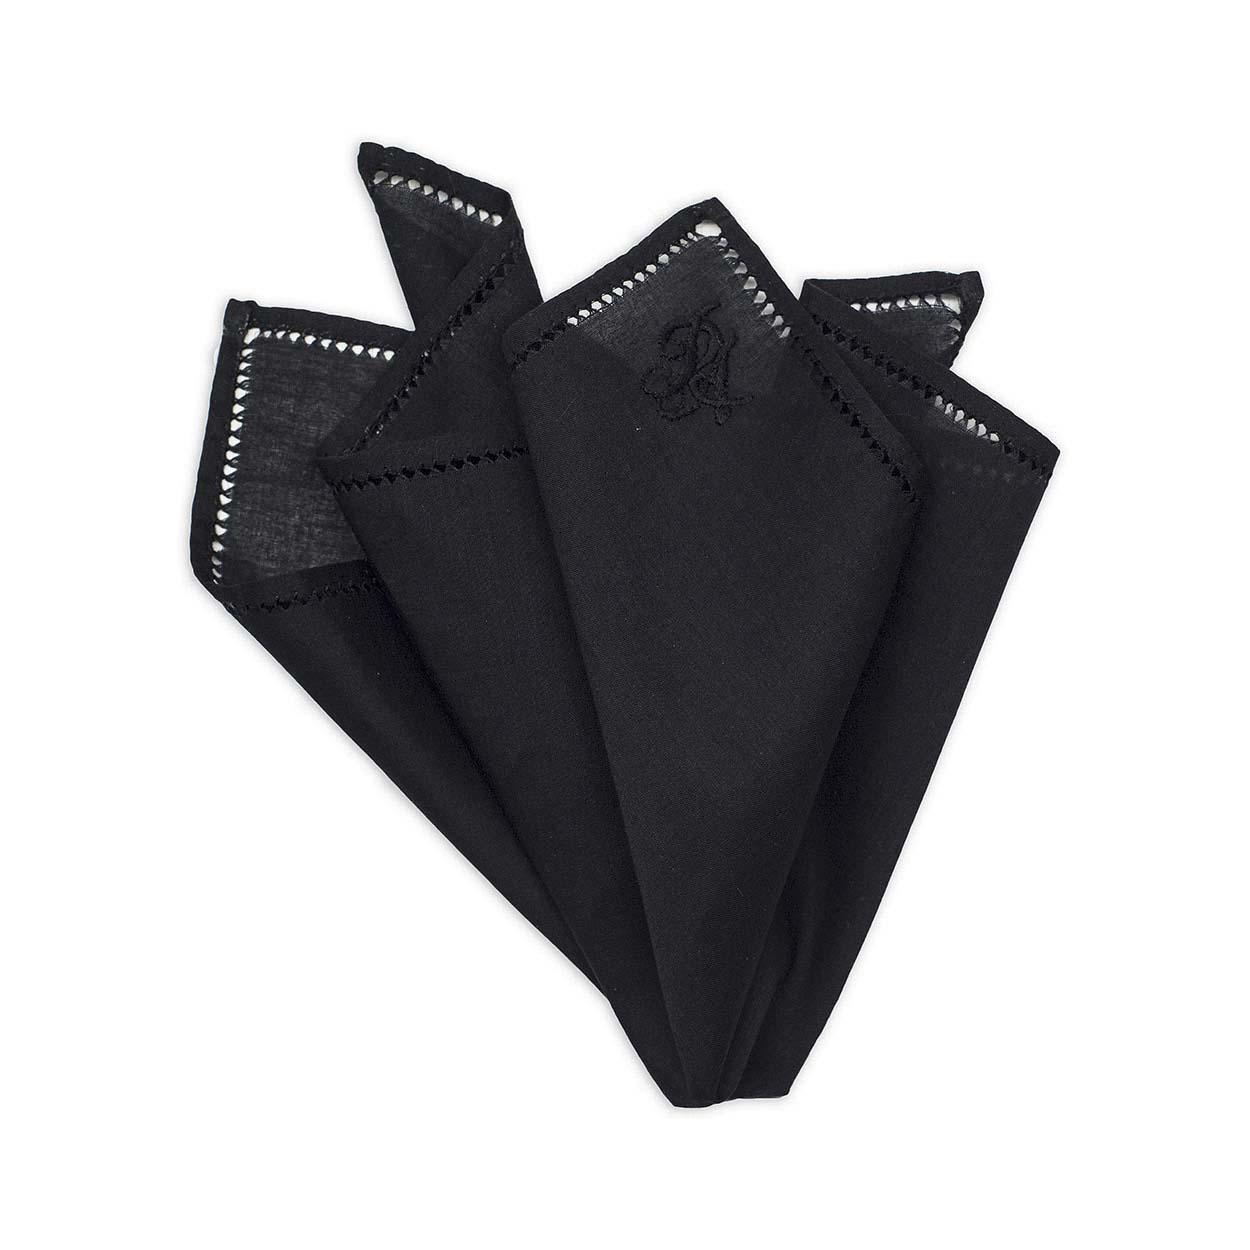 670474059e69d Personalised Black Cotton Pocket Square • ΚΥΔΟΣ